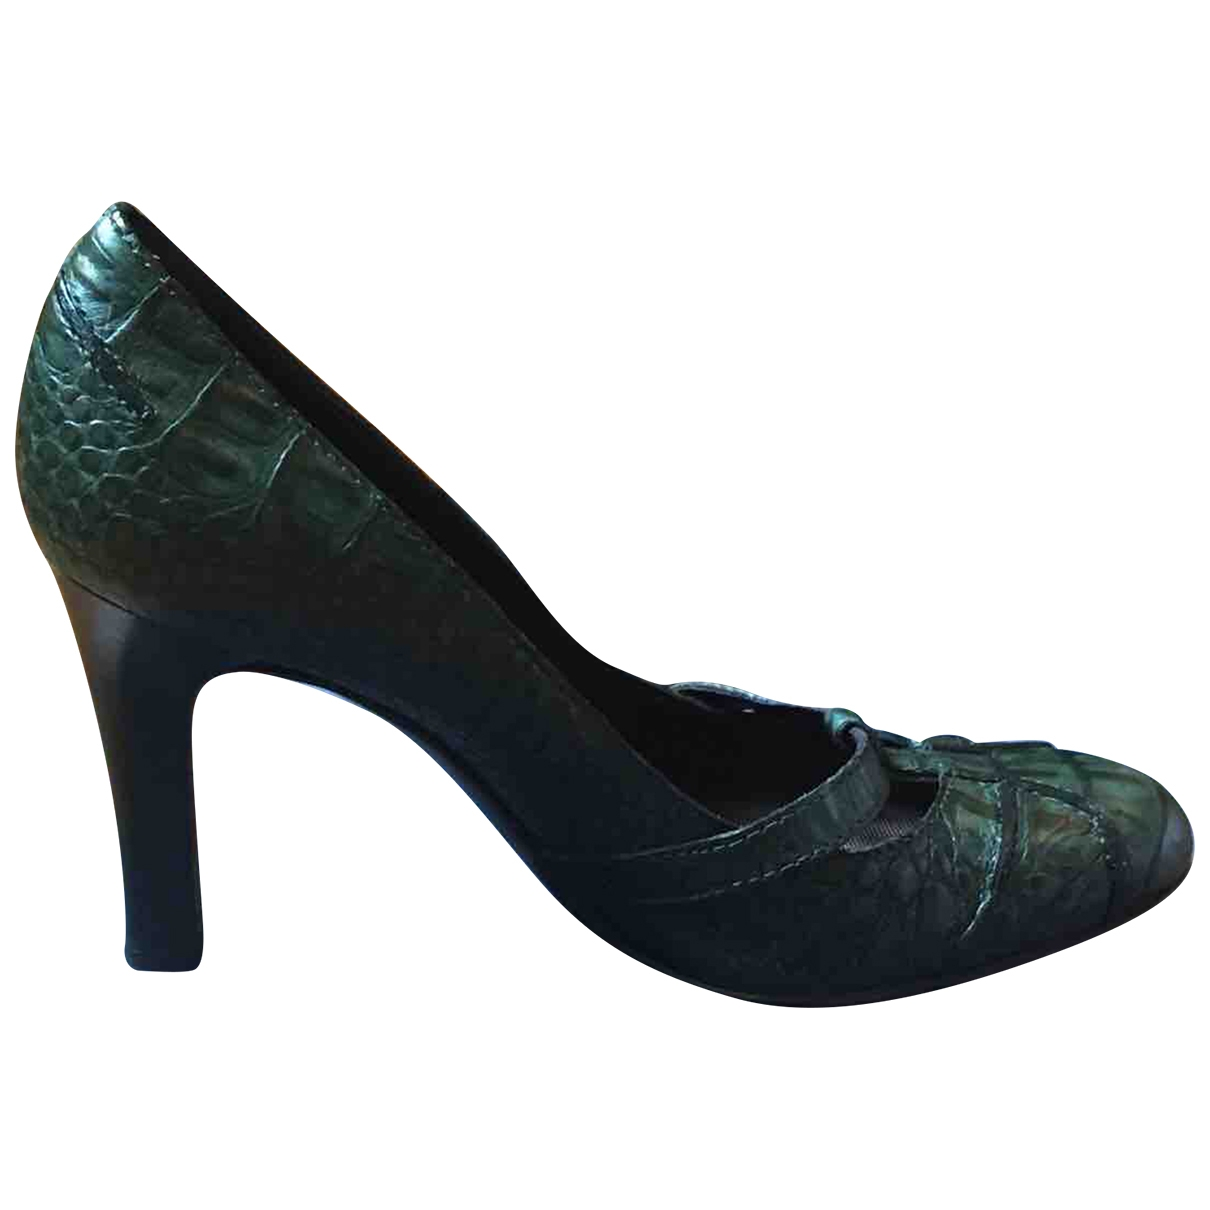 Alberta Ferretti \N Green Leather Heels for Women 36 EU